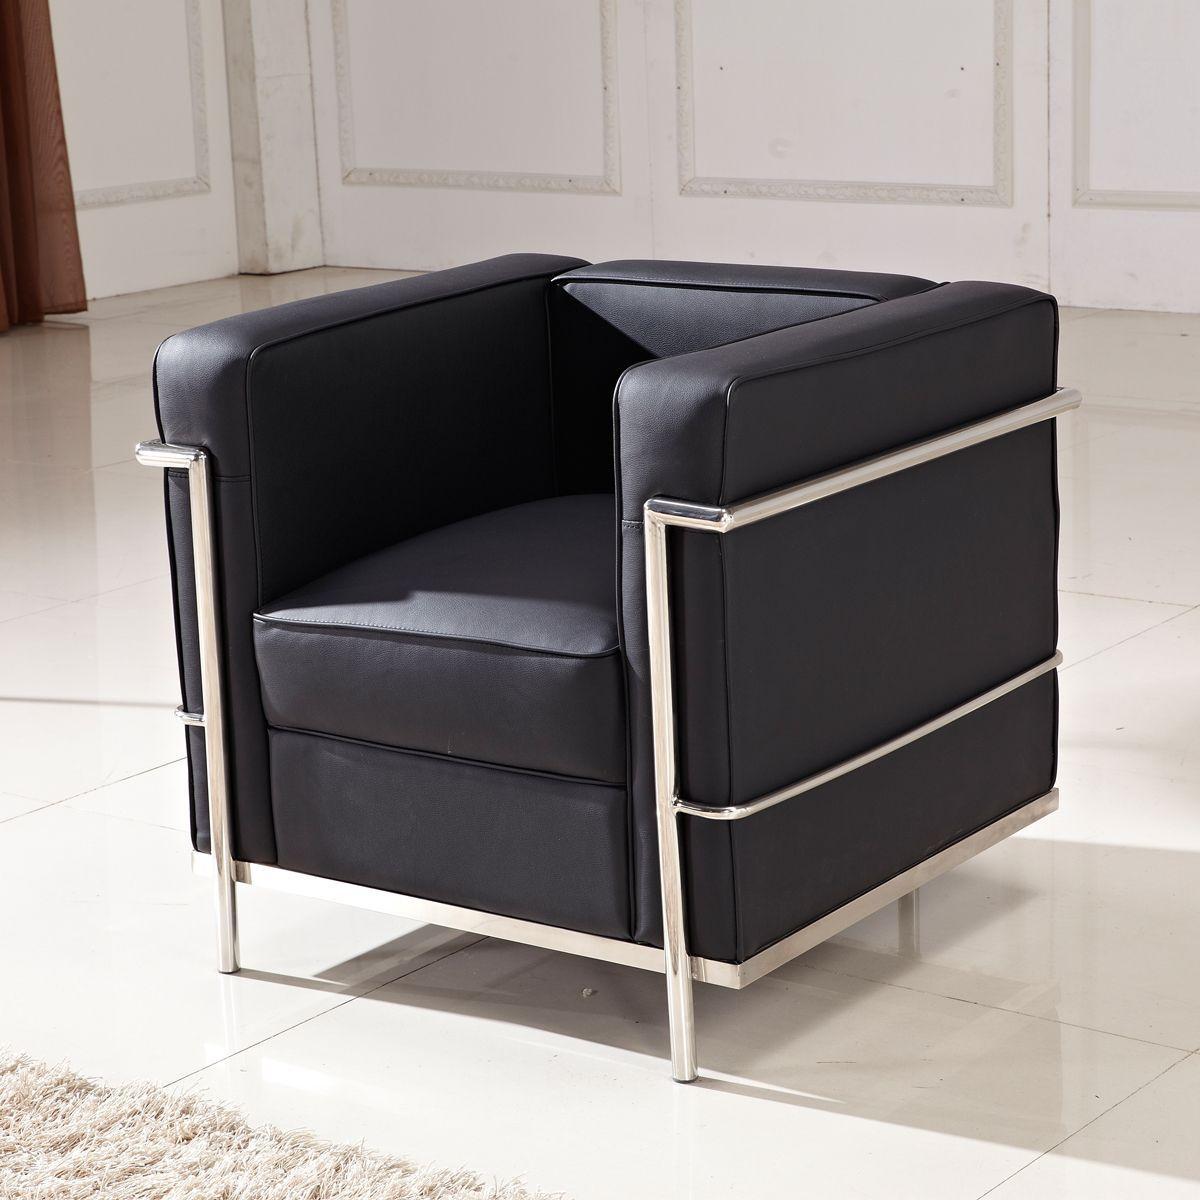 Acquista Le Corbusier Lc2 Petit Comfort Sedia Sofà, Pelle Di Cuoio ...